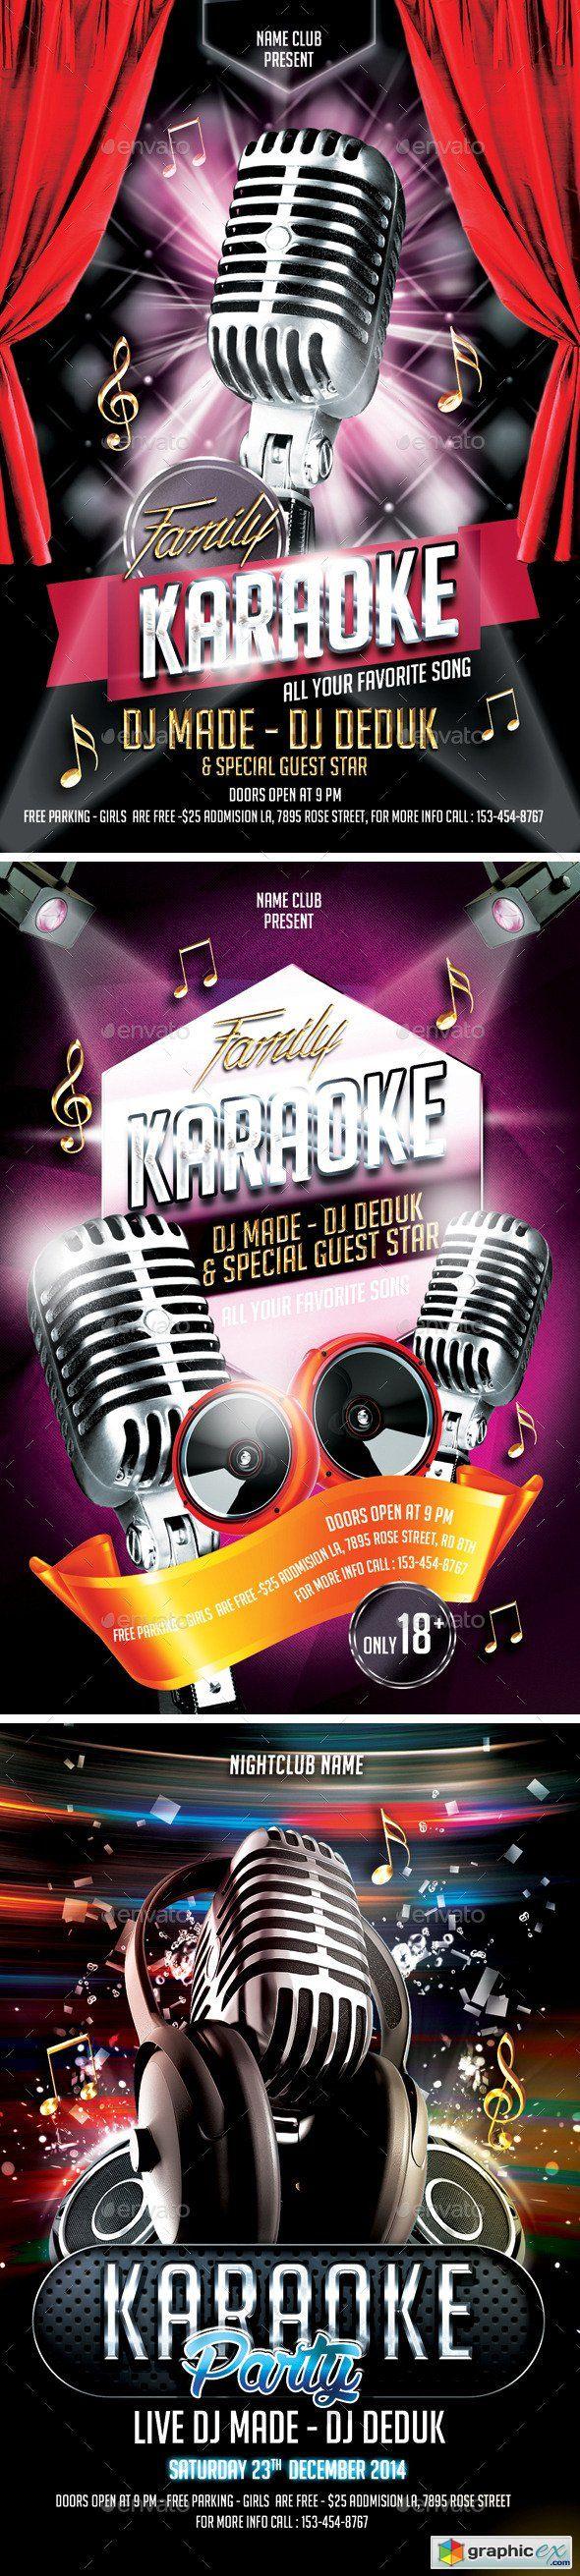 Bollywood Karaoke Flyer Ibovnathandedecker